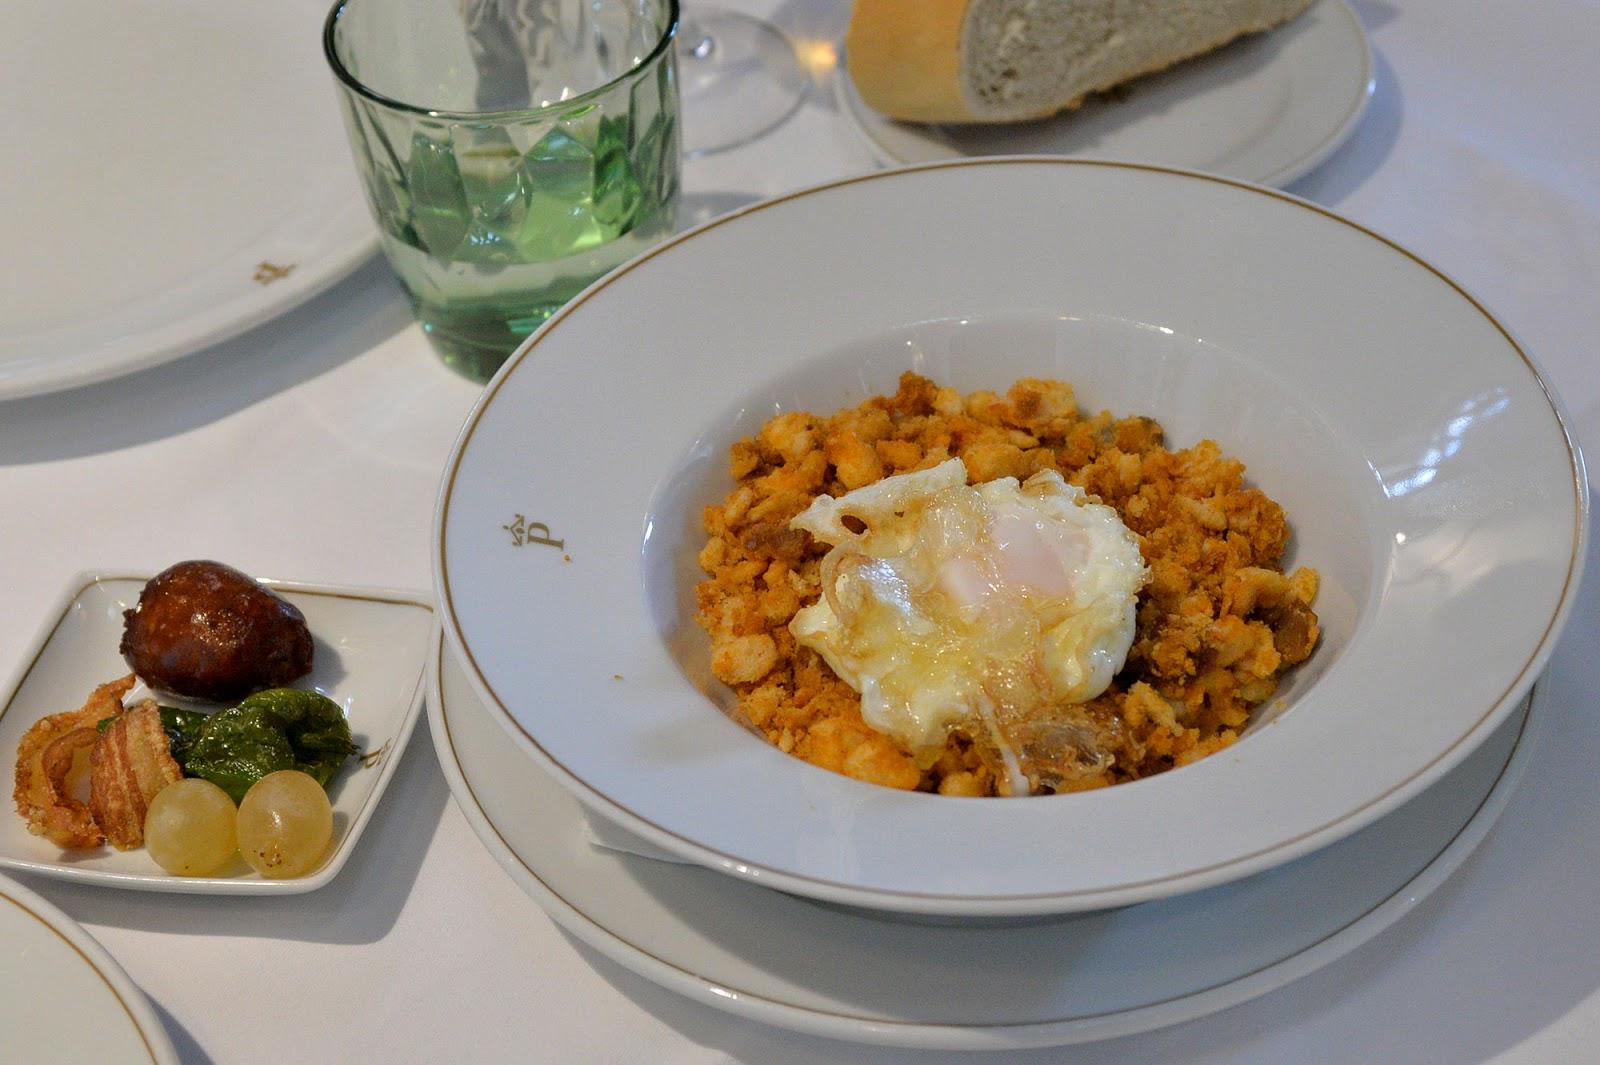 parador oropesa toledo spain history castle luxury hotel food